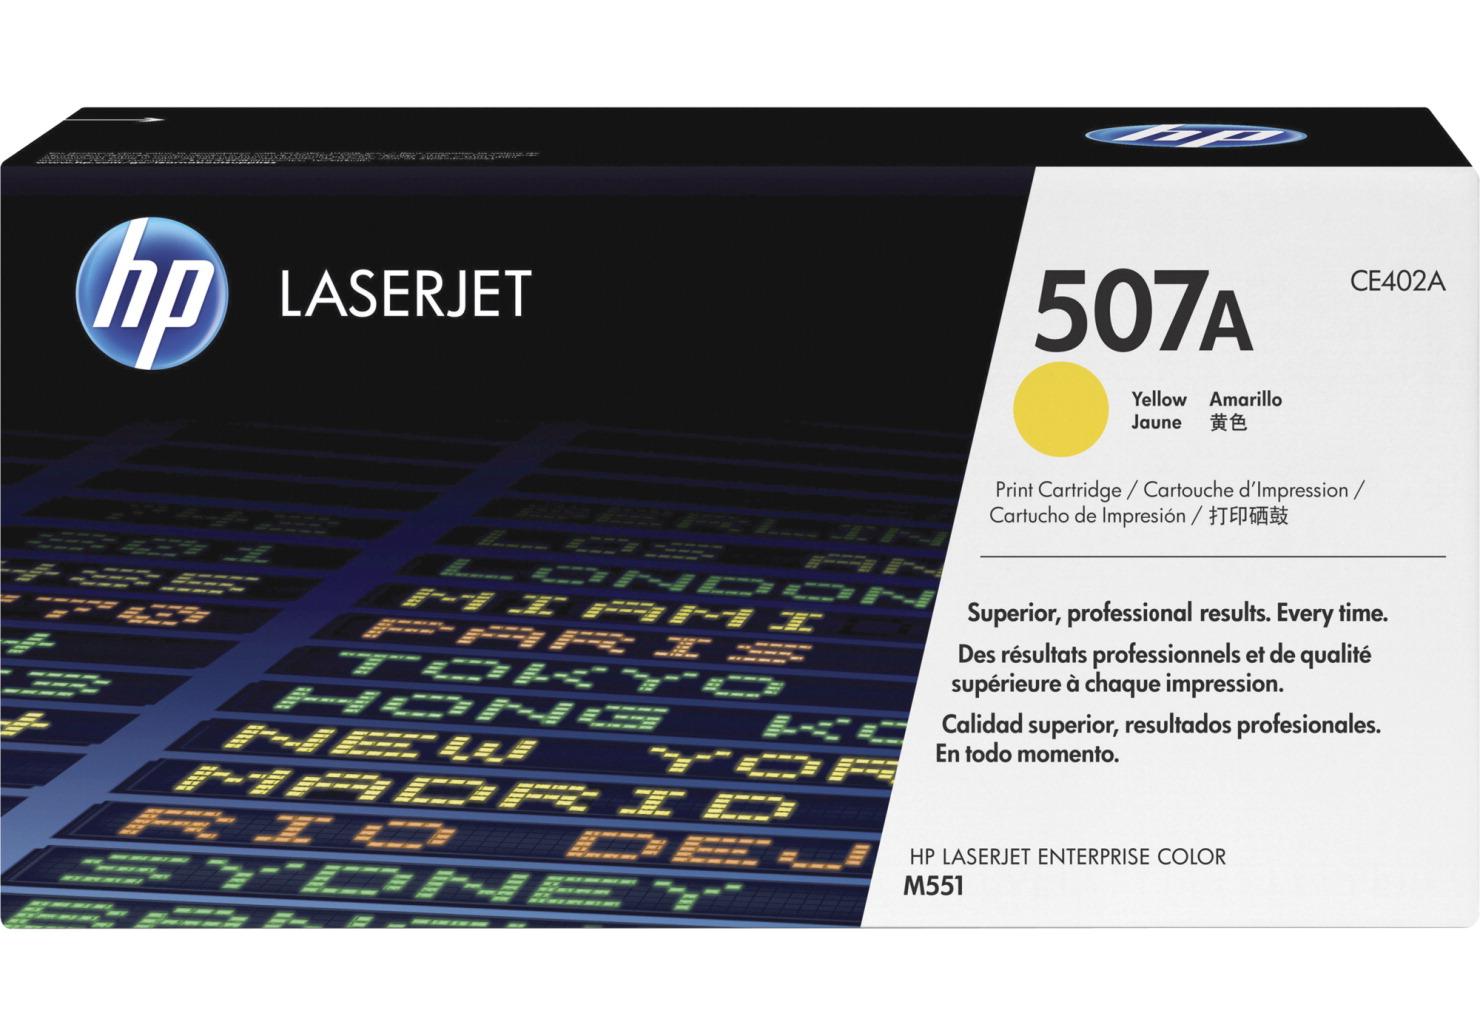 Hp original reliable toner cartridge yellow school for Hp color laserjet cost per page